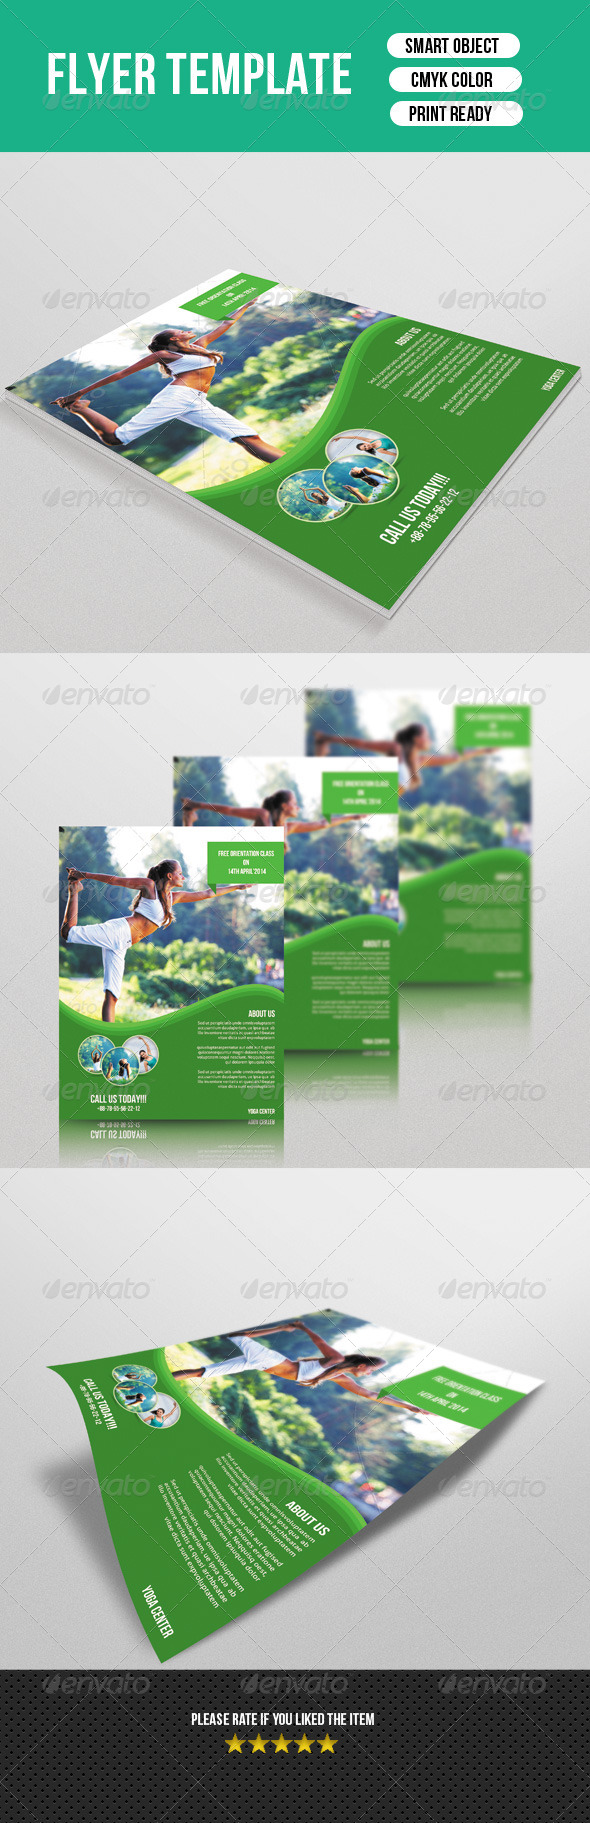 GraphicRiver Yoga Flyer 7434006